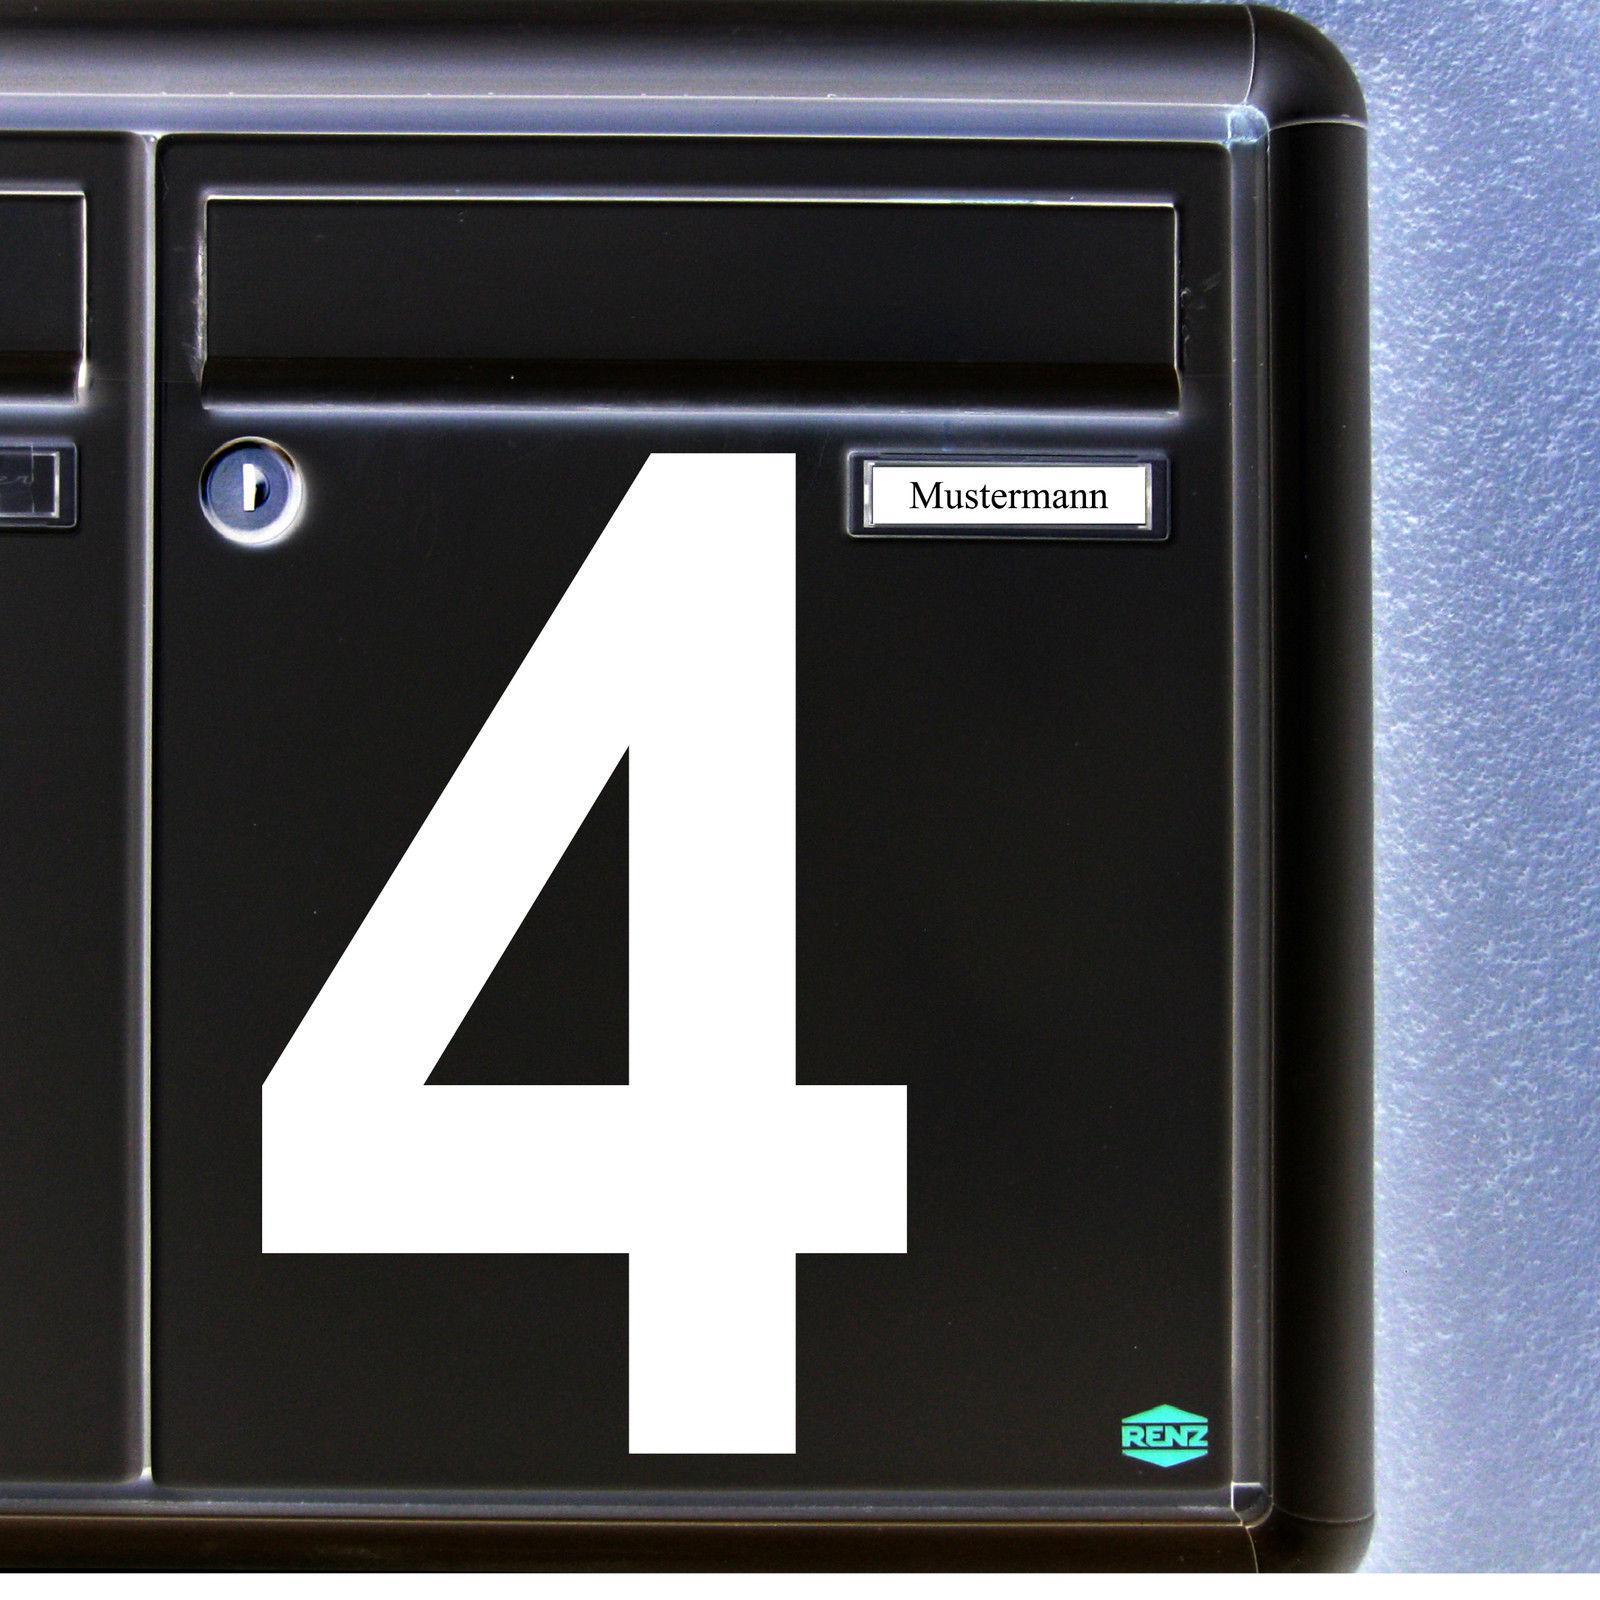 1 Stück 15cm Weiß Aufkleber Tattoo Hausnummer Wunschziffer Zahl Nummer Ziffer